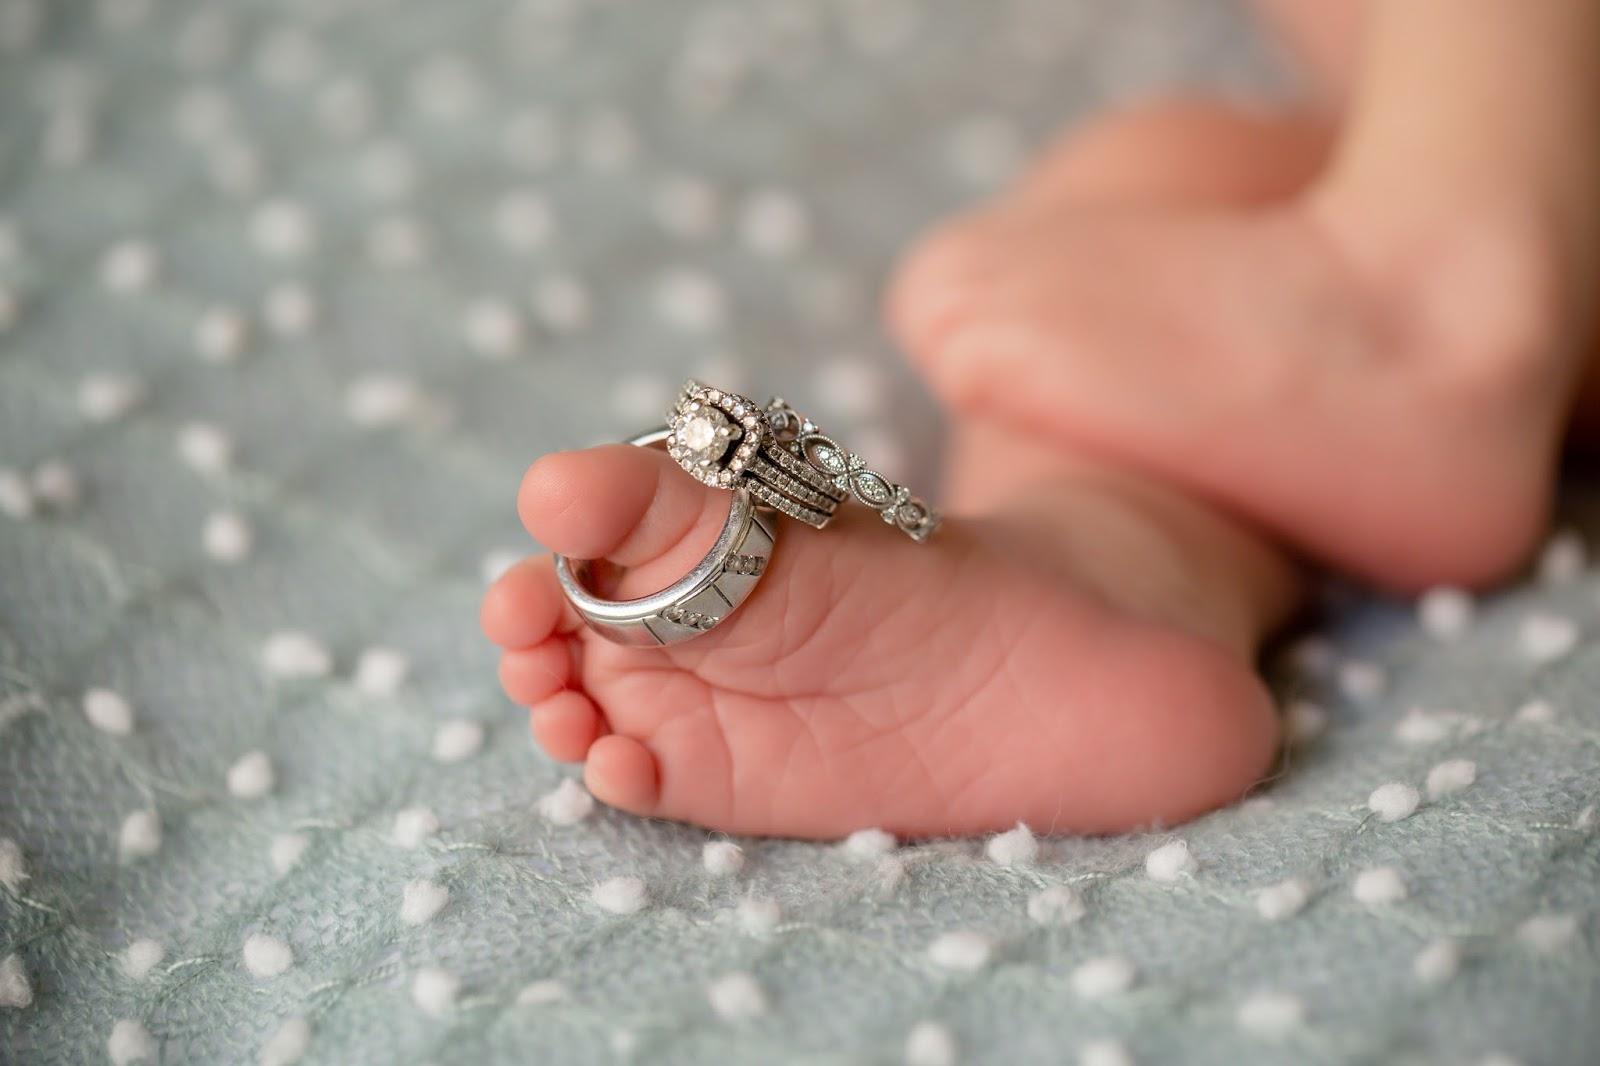 Shane Company newborn ring toes